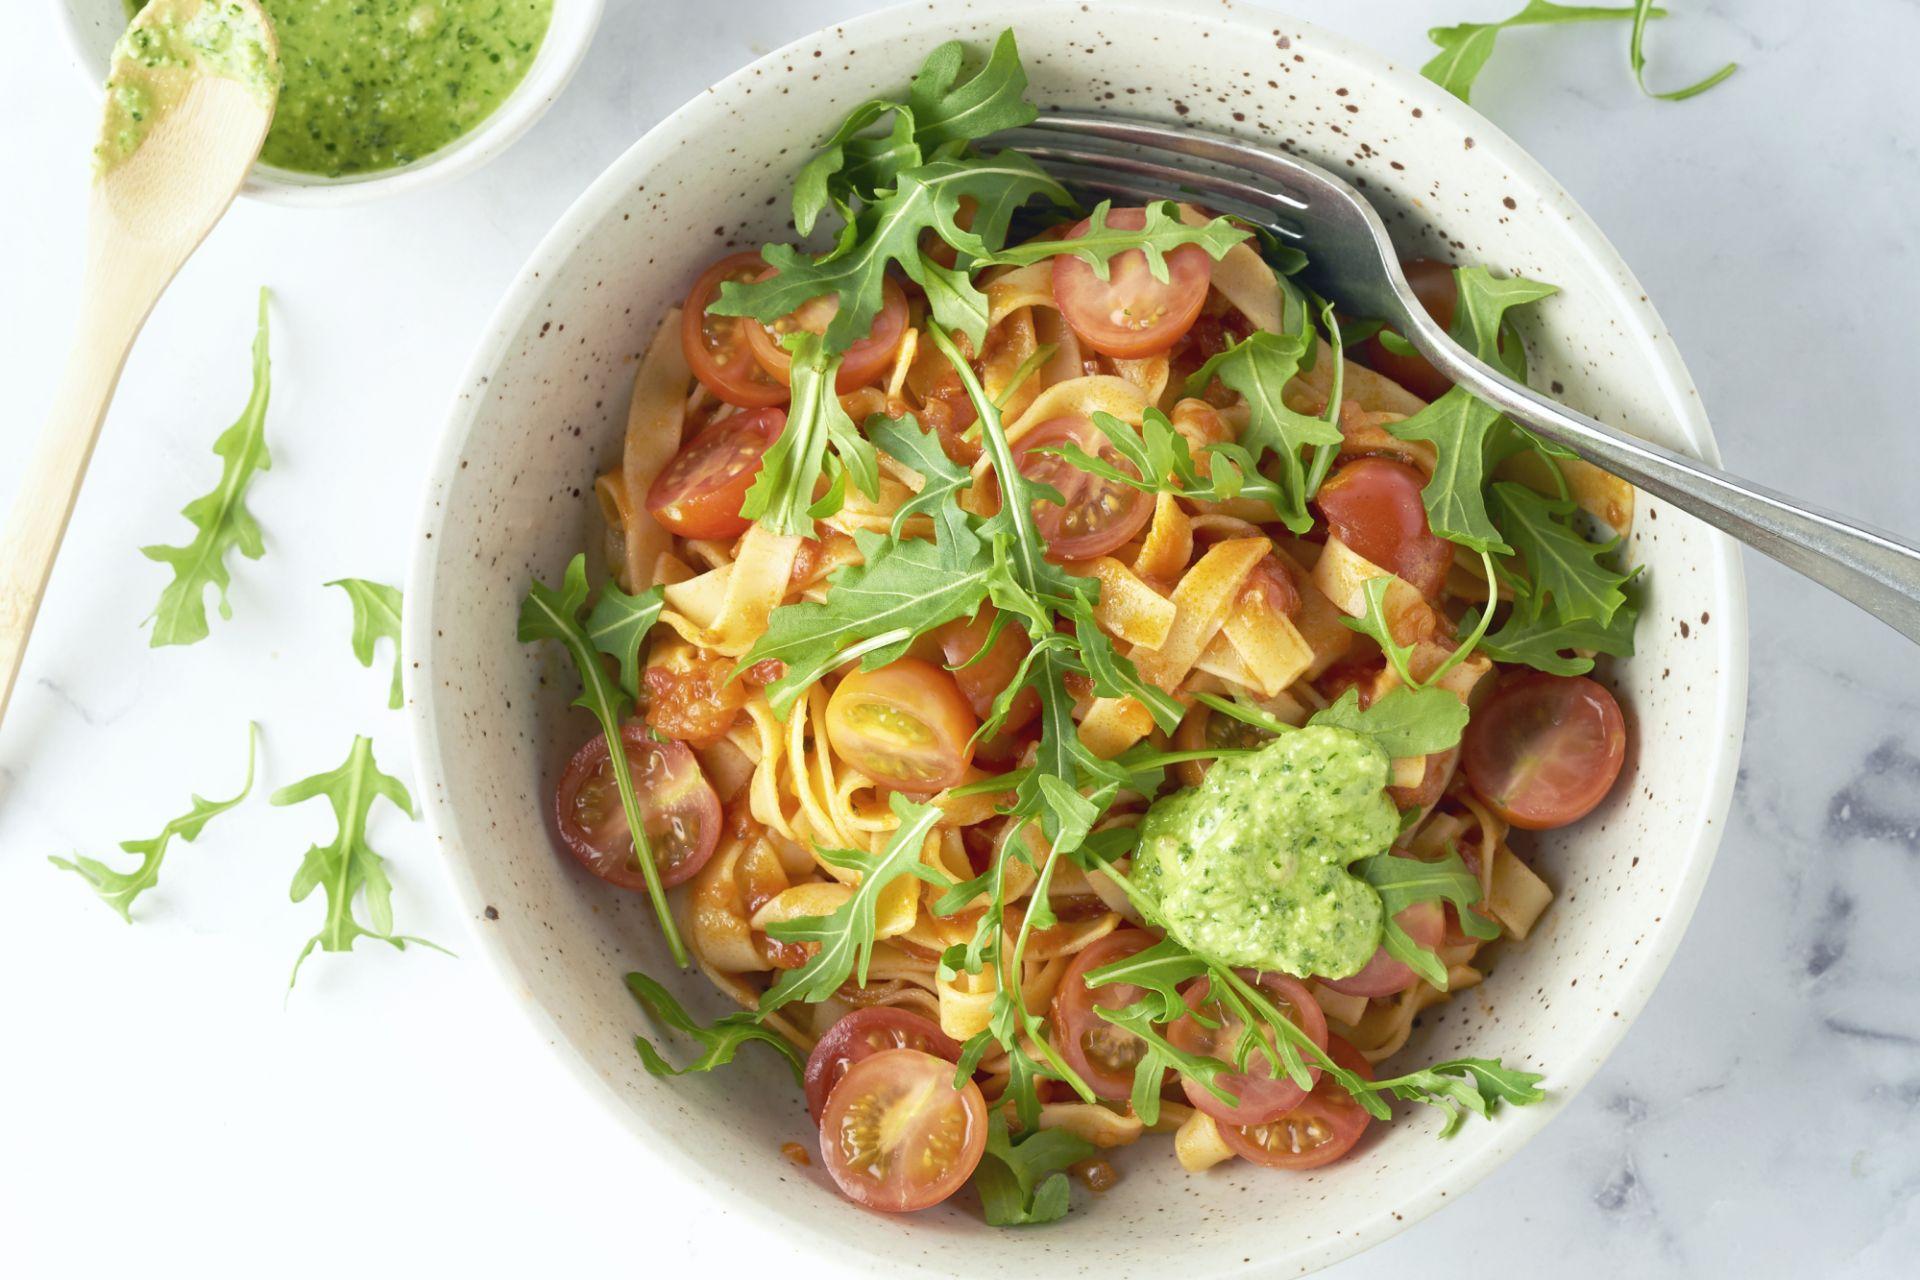 Tagliatelle met tomatensaus, kerstomaten en rucolapesto